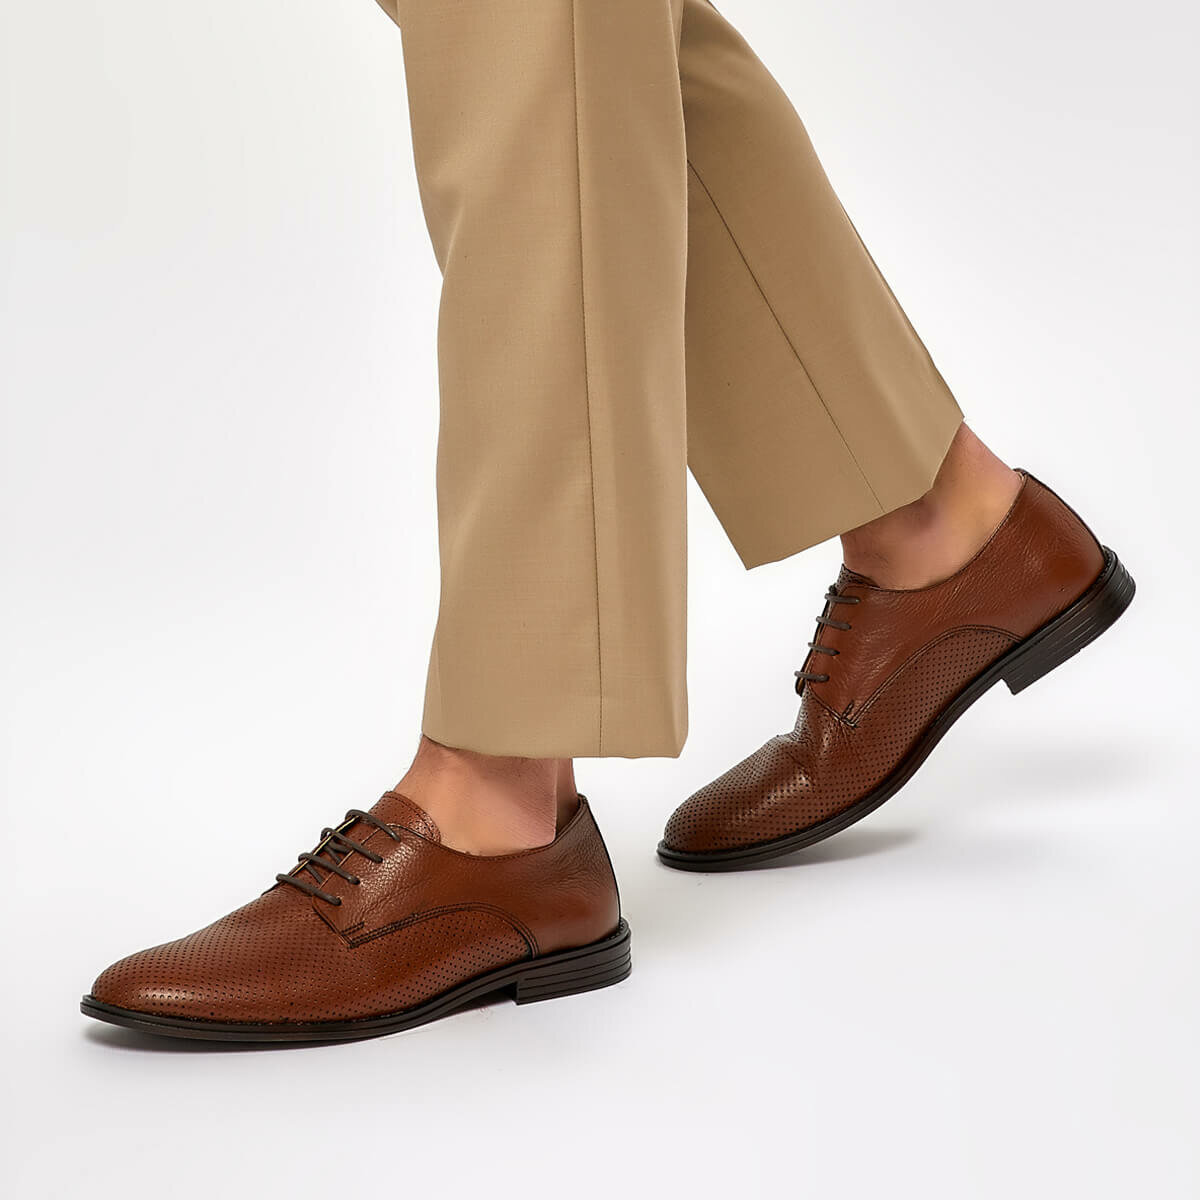 FLO 1300 Tan Men 'S Classic Shoes Garamond